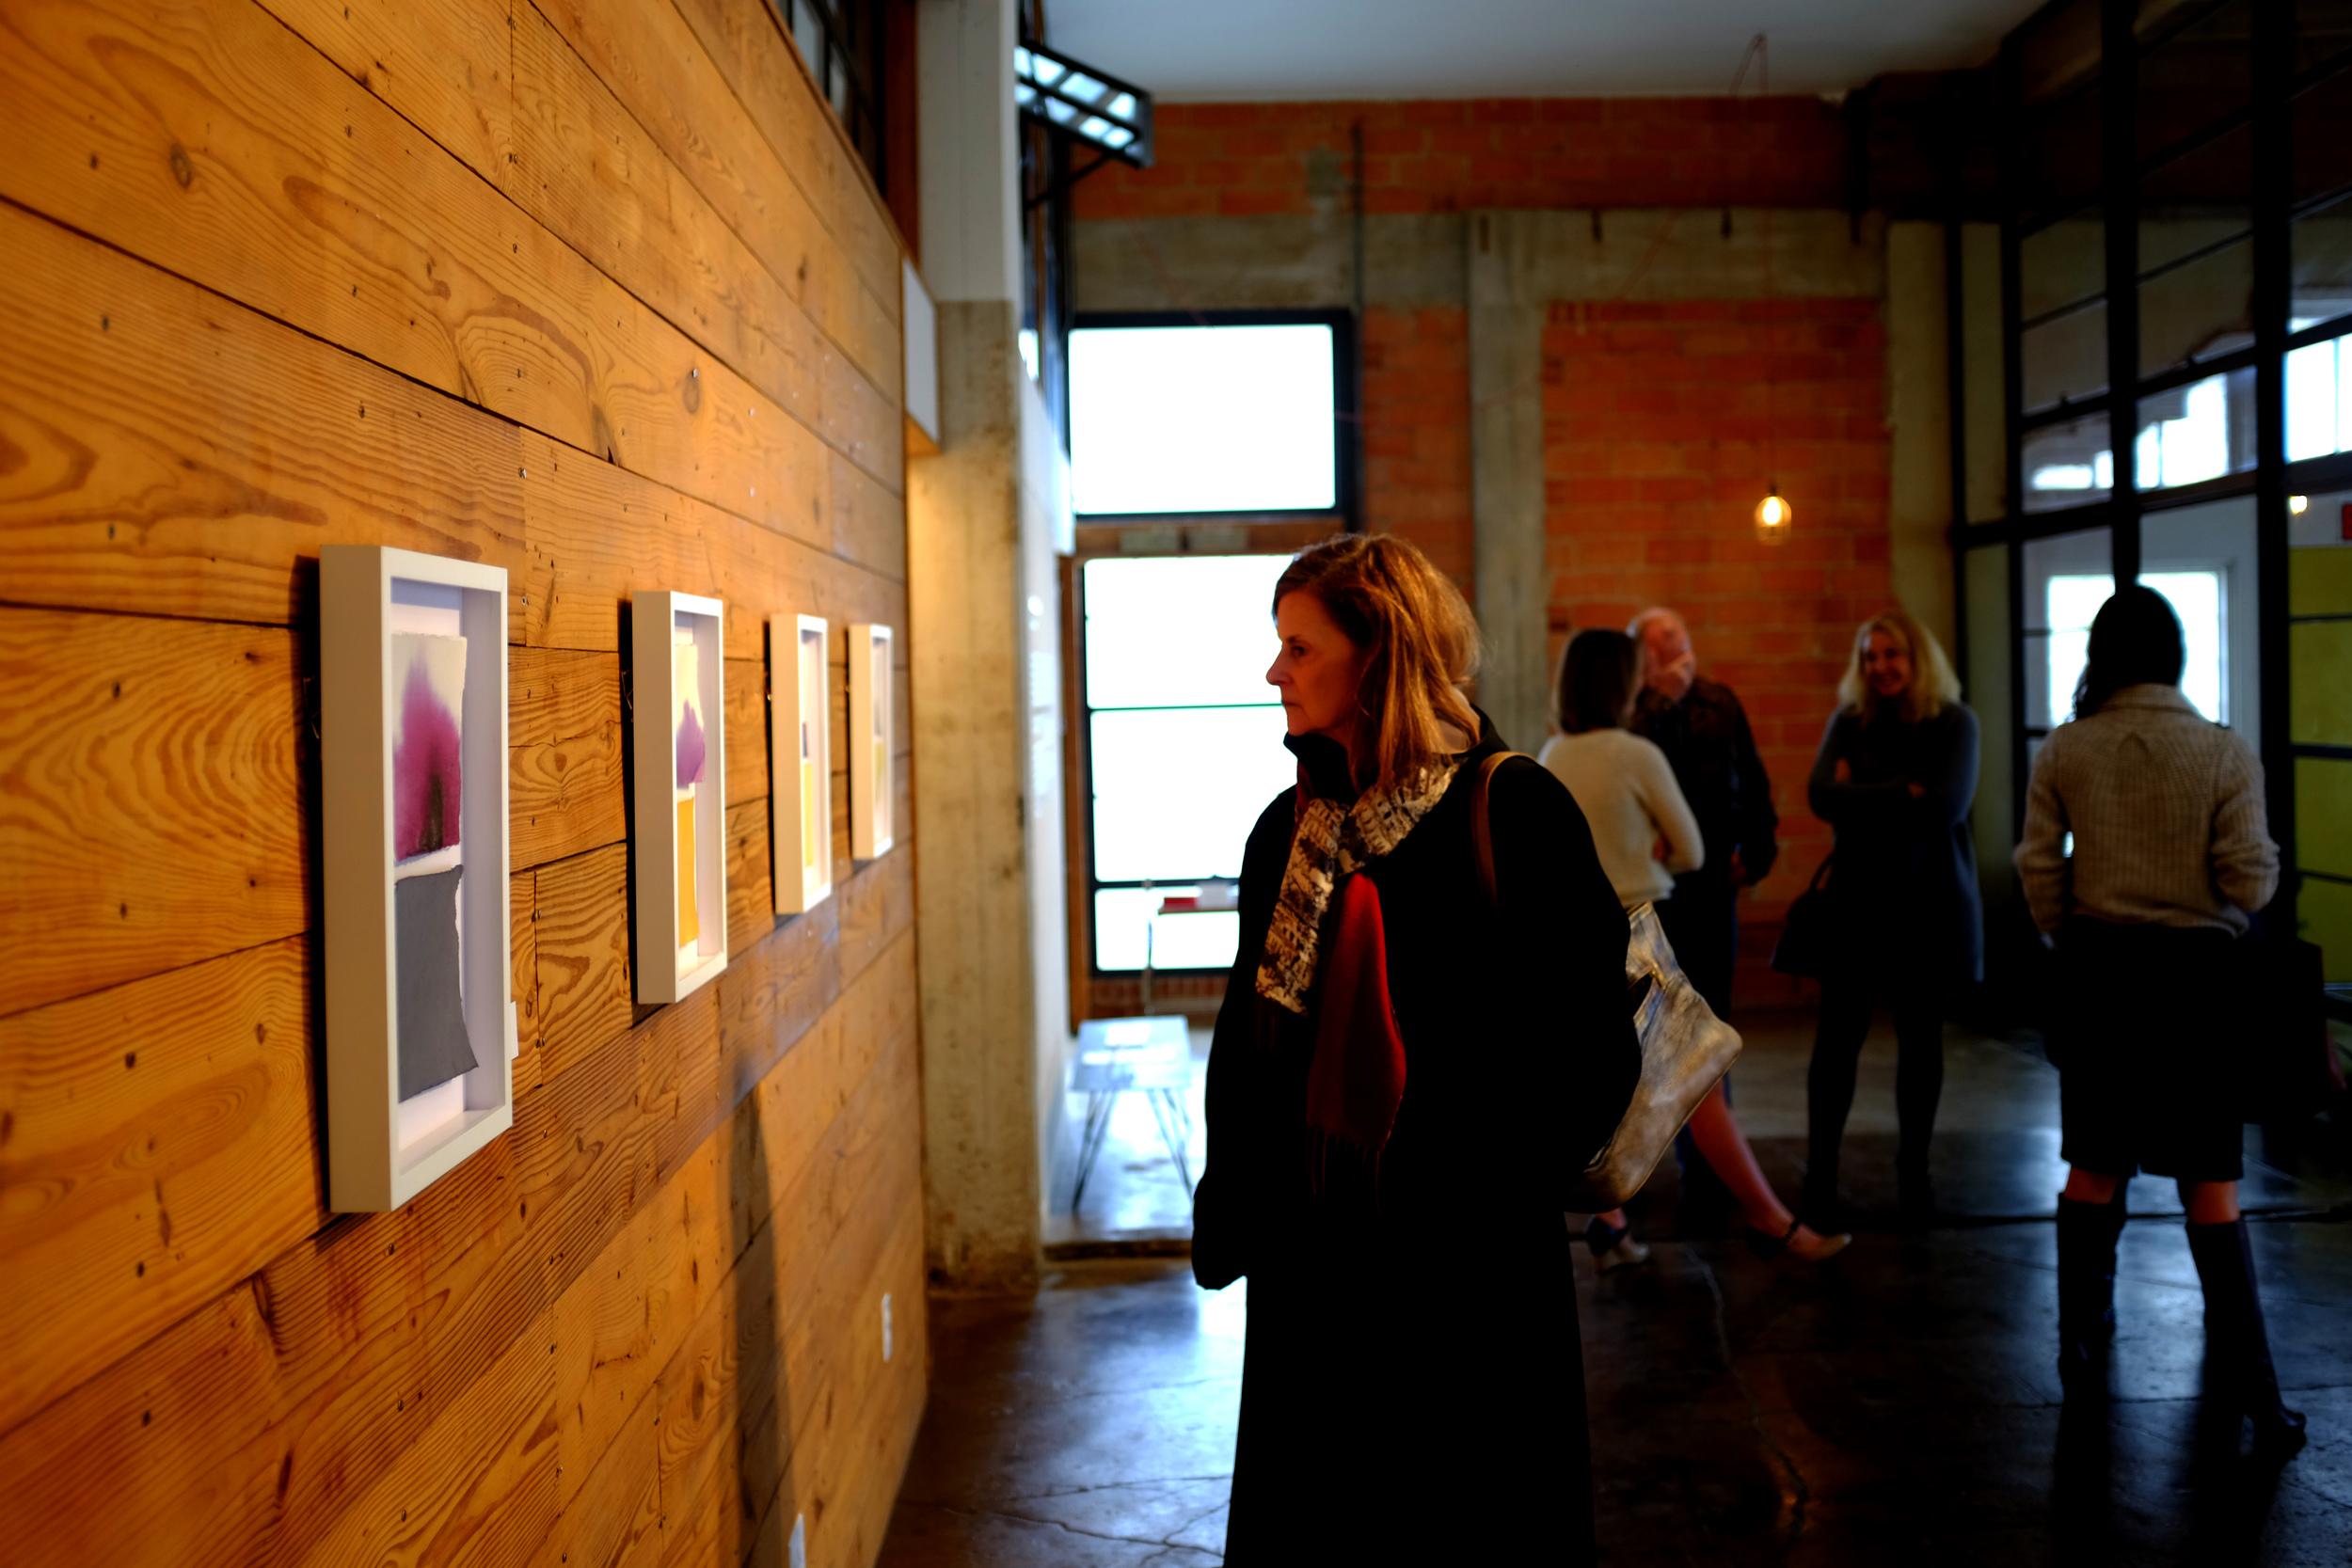 Cornelia White Swann: Fugitive Color I